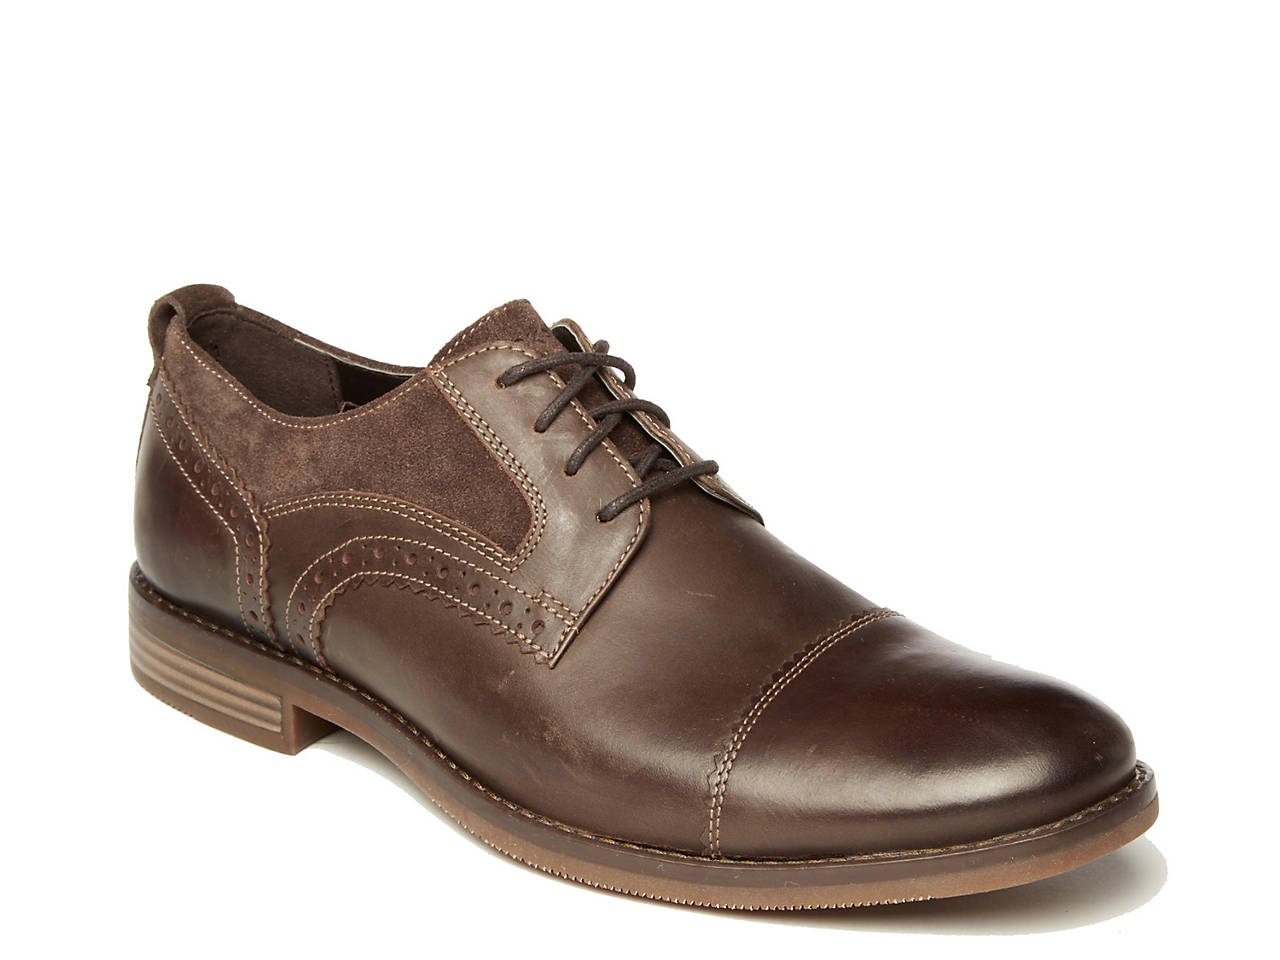 383f8b1211798 Rockport Wynstin Cap Toe Oxford Men's Shoes | DSW